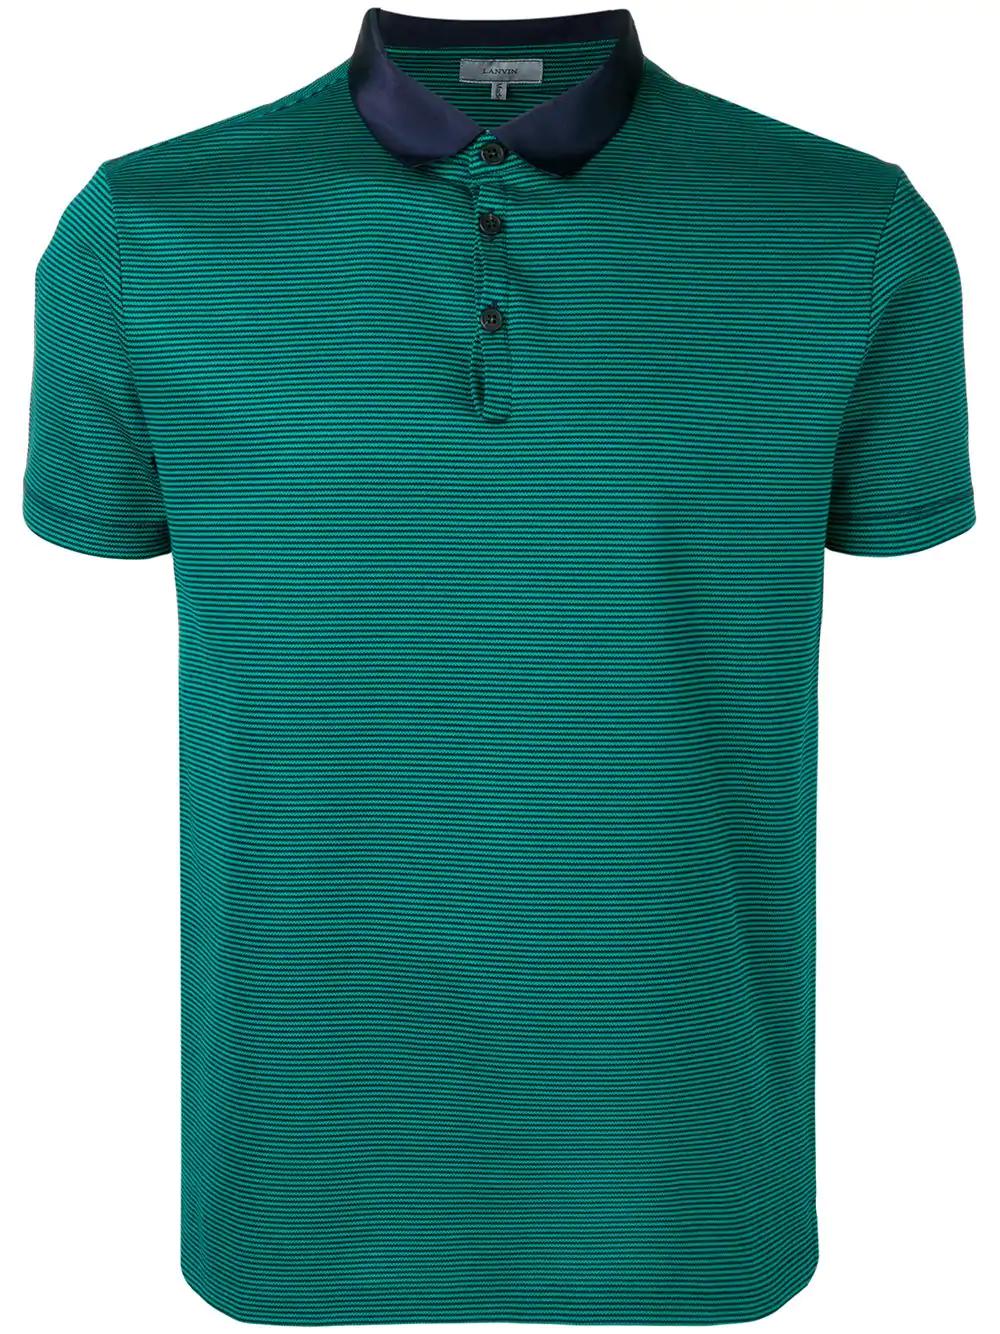 1a9bef00ad Lanvin Striped Polo Shirt Green Modesens. Ralph Lauren Childrenswear ...